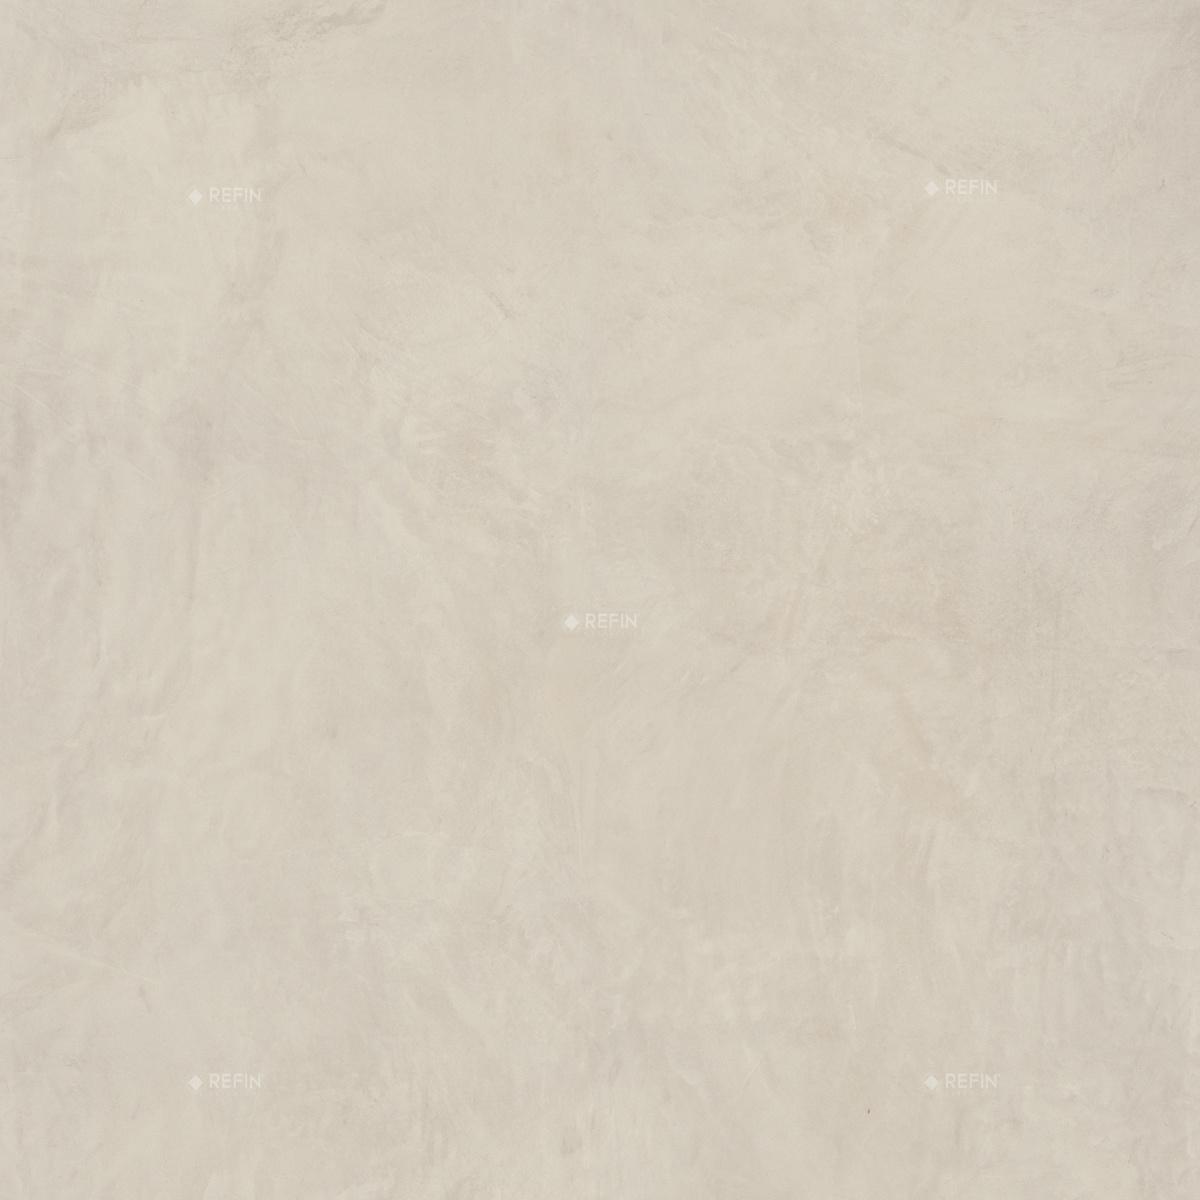 Large Format Resin Tiles Creos Collection Ceramiche Refin Spa